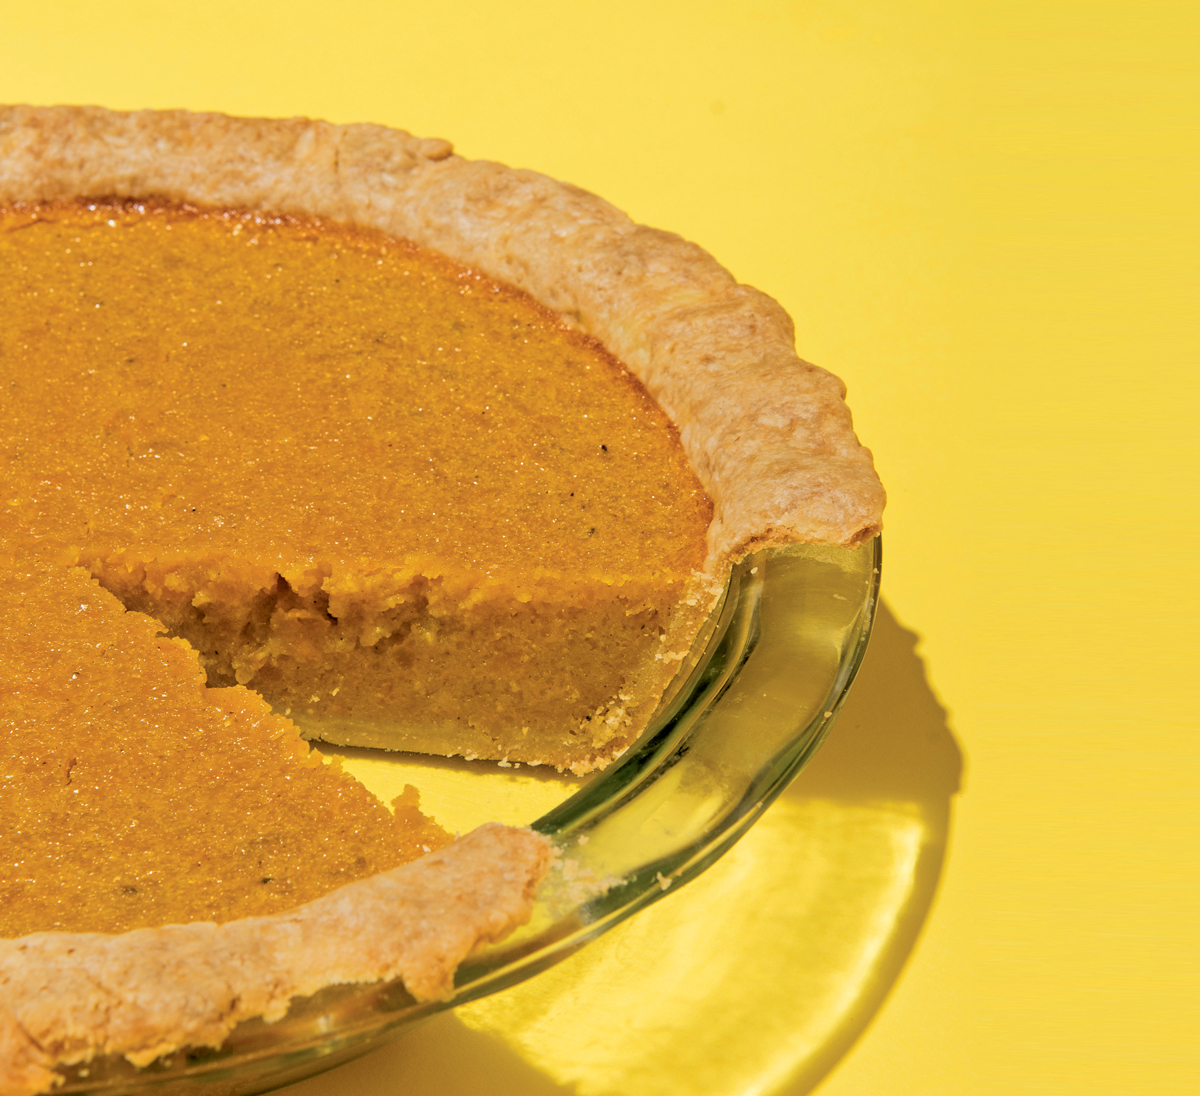 Squash and cornmeal pie